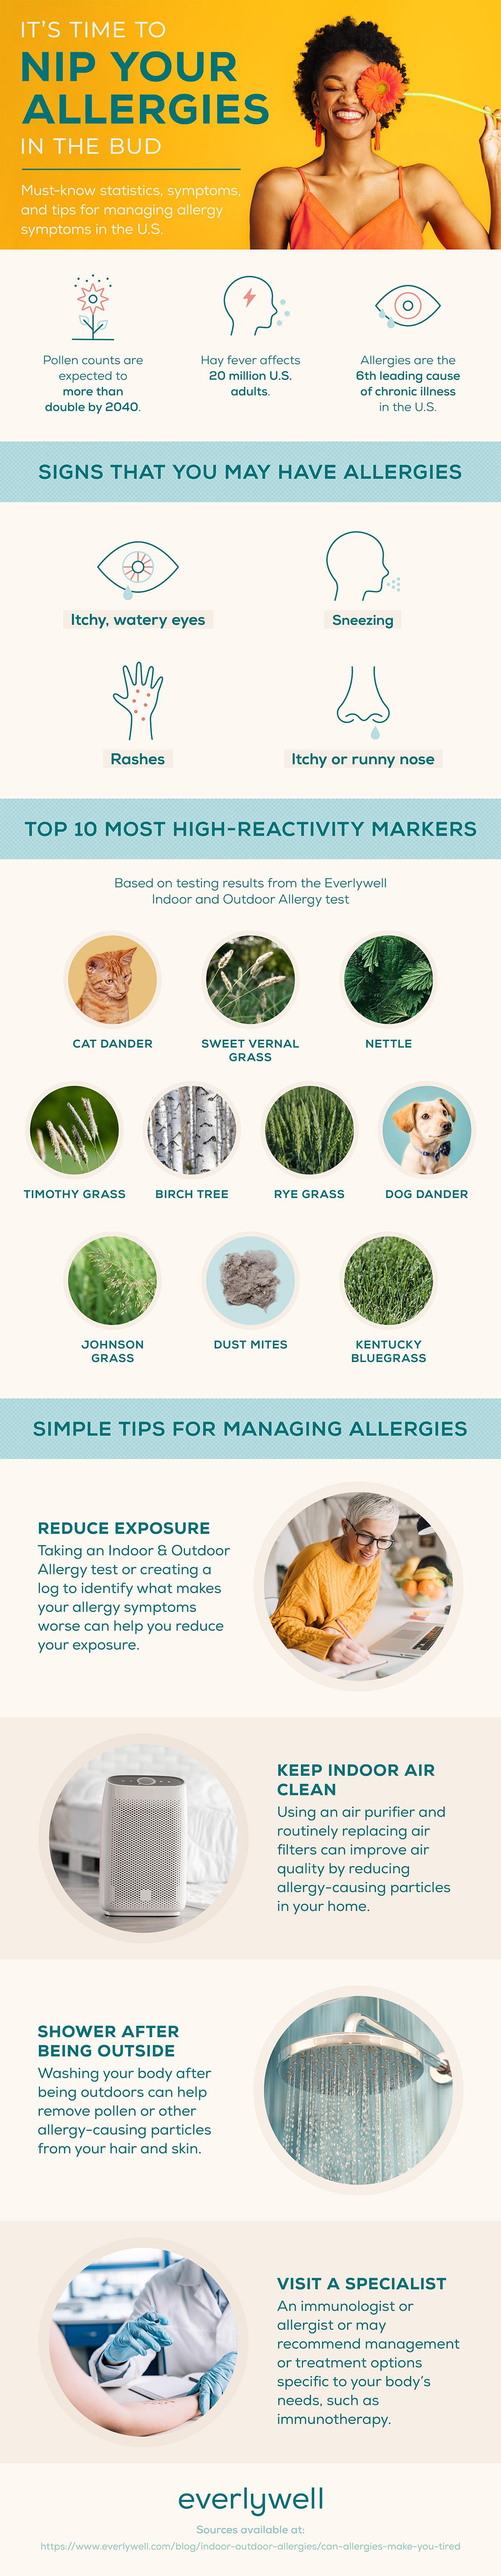 worst-cities-for-allergies-ig (1)